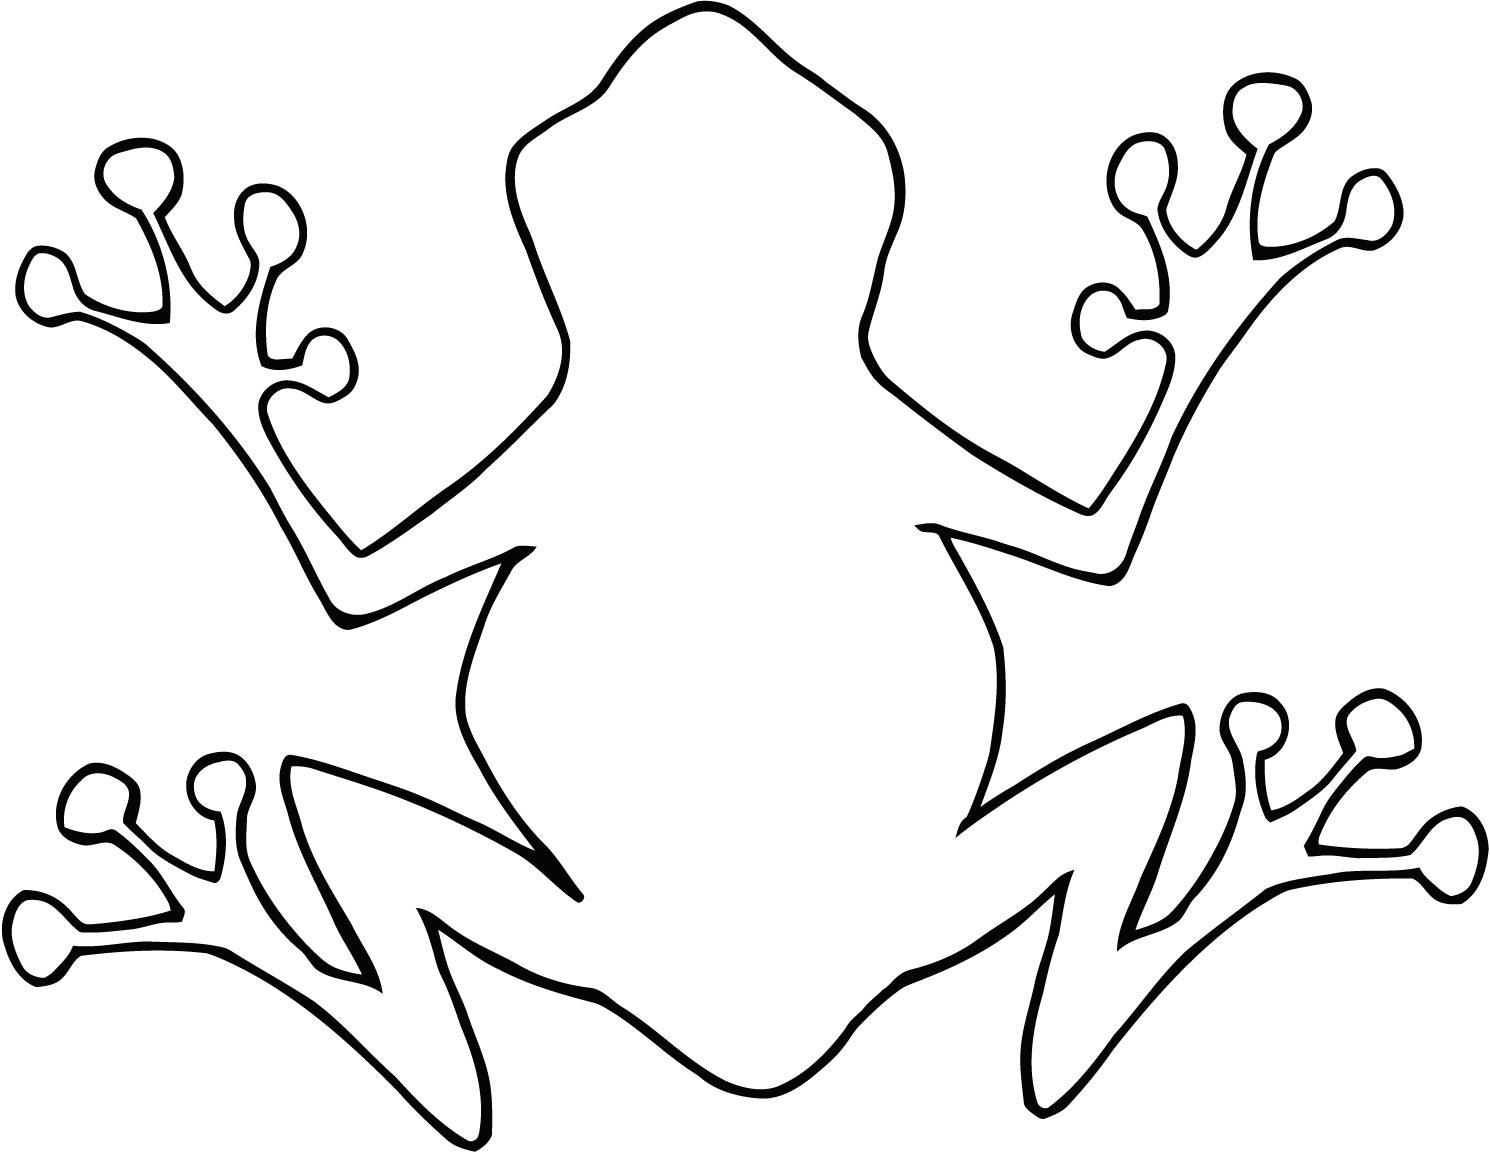 Pix For Tree Frog Outline